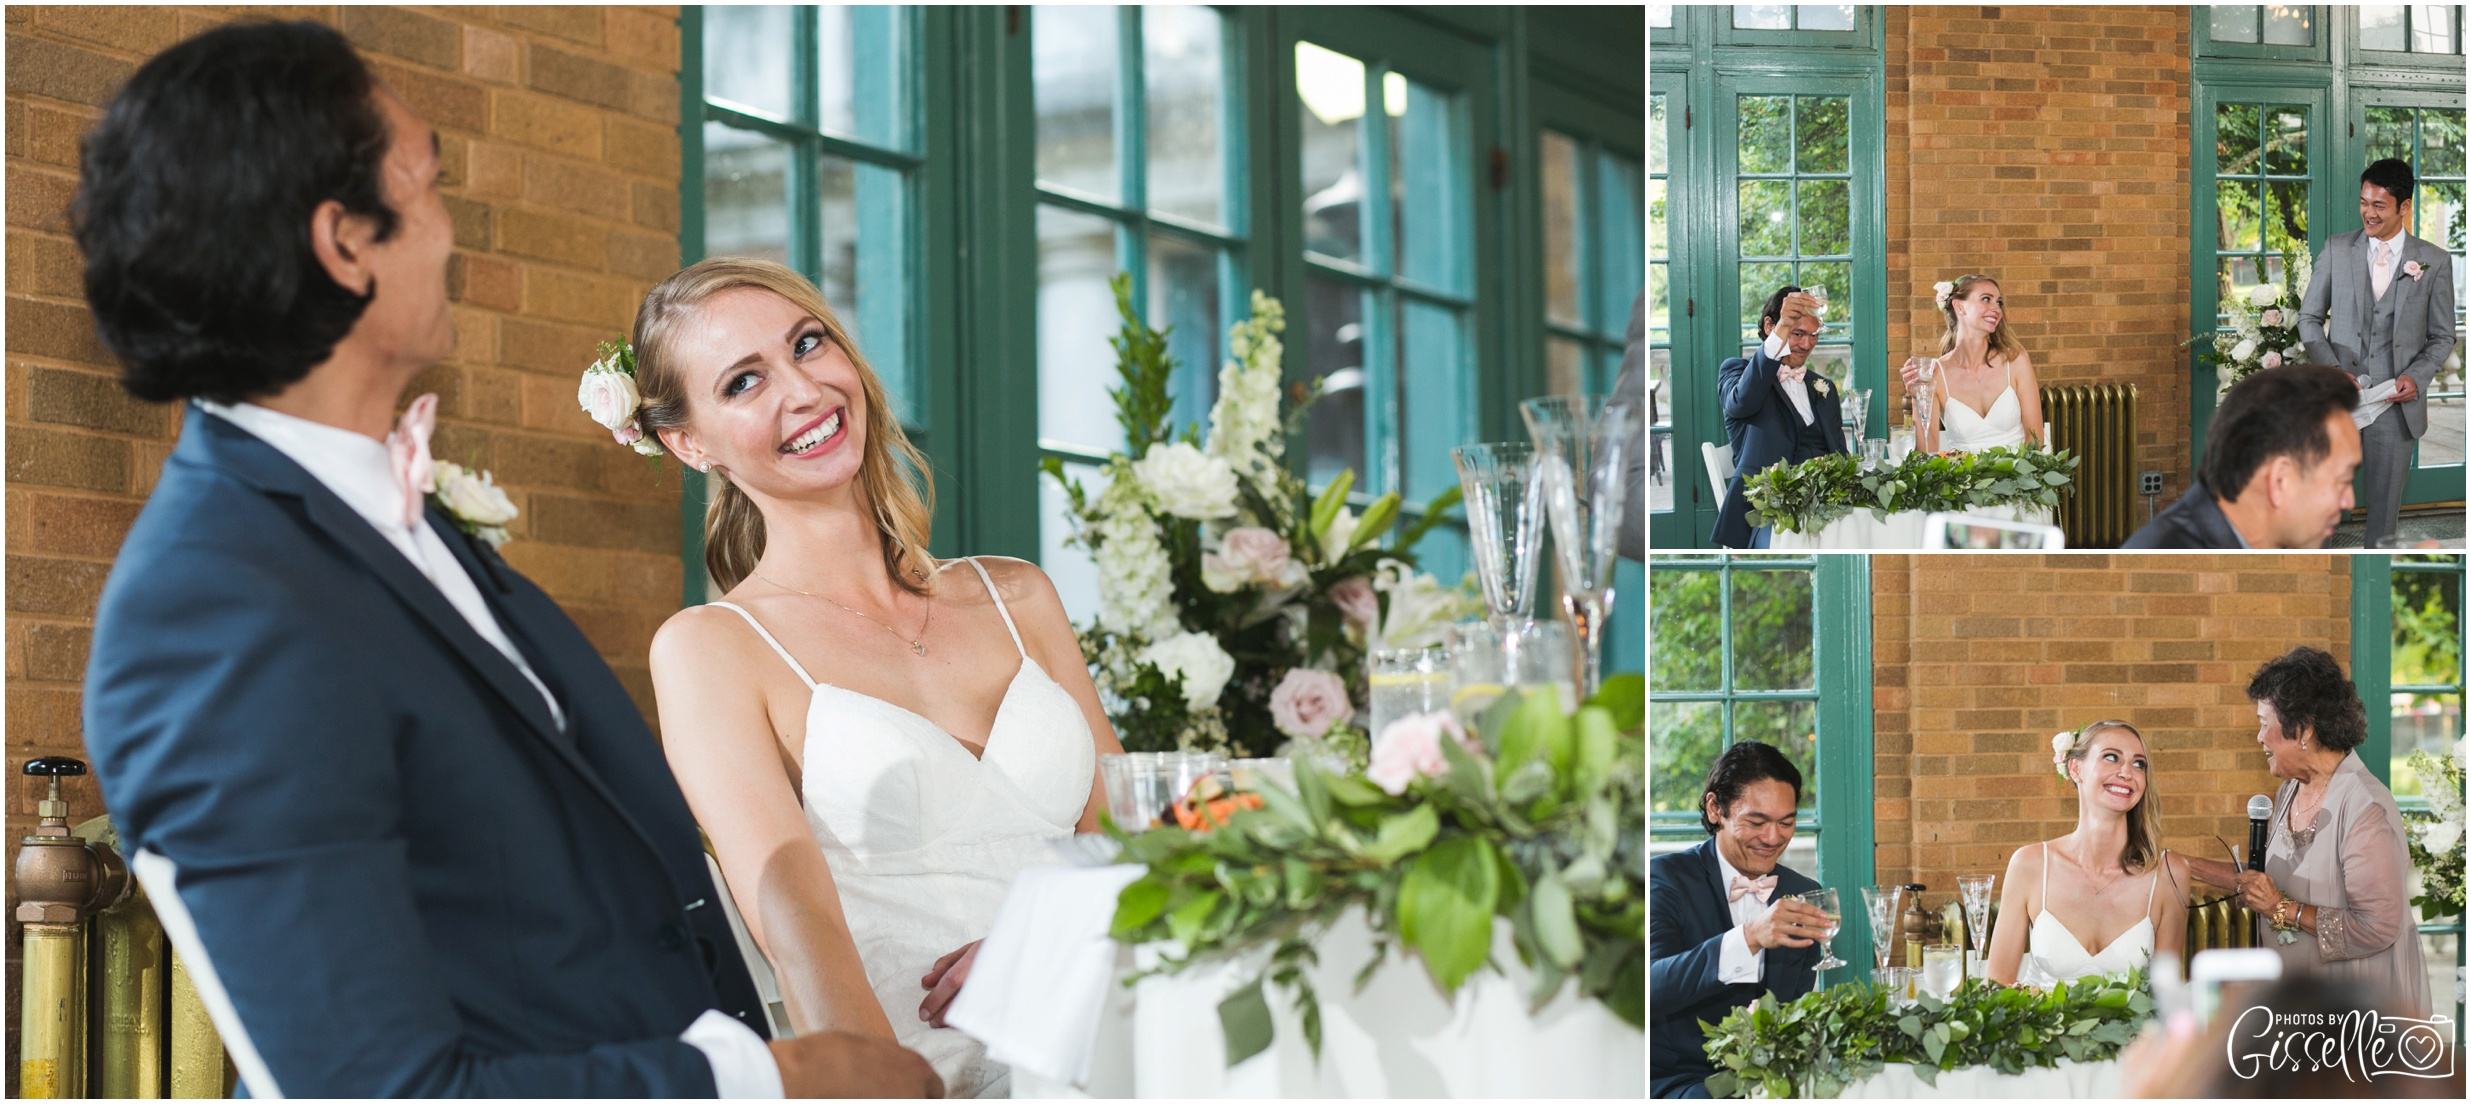 Columbus Park Refectory Wedding_0021.jpg